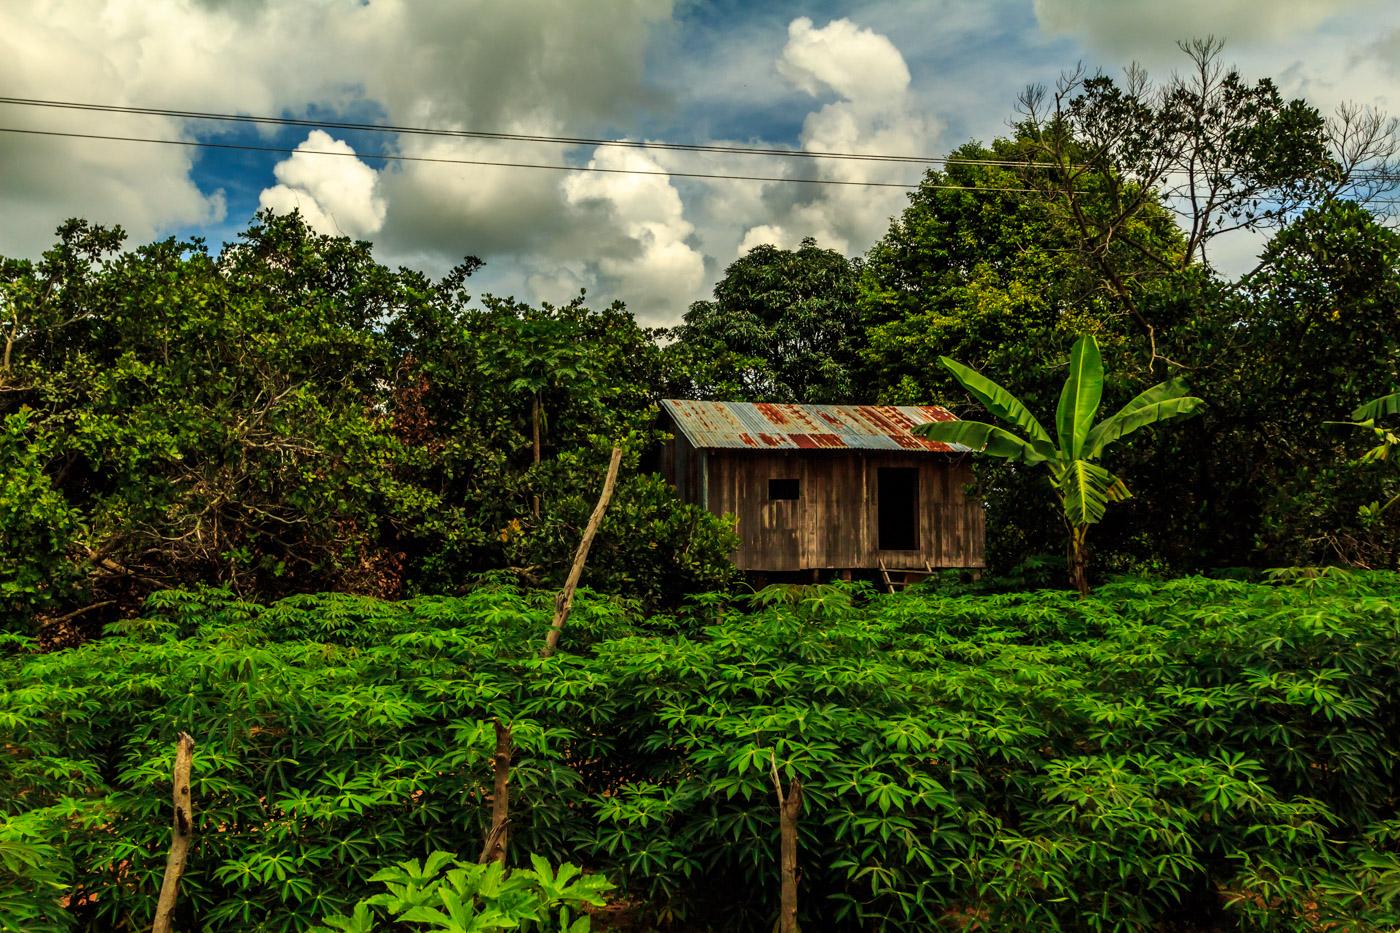 House among the green.